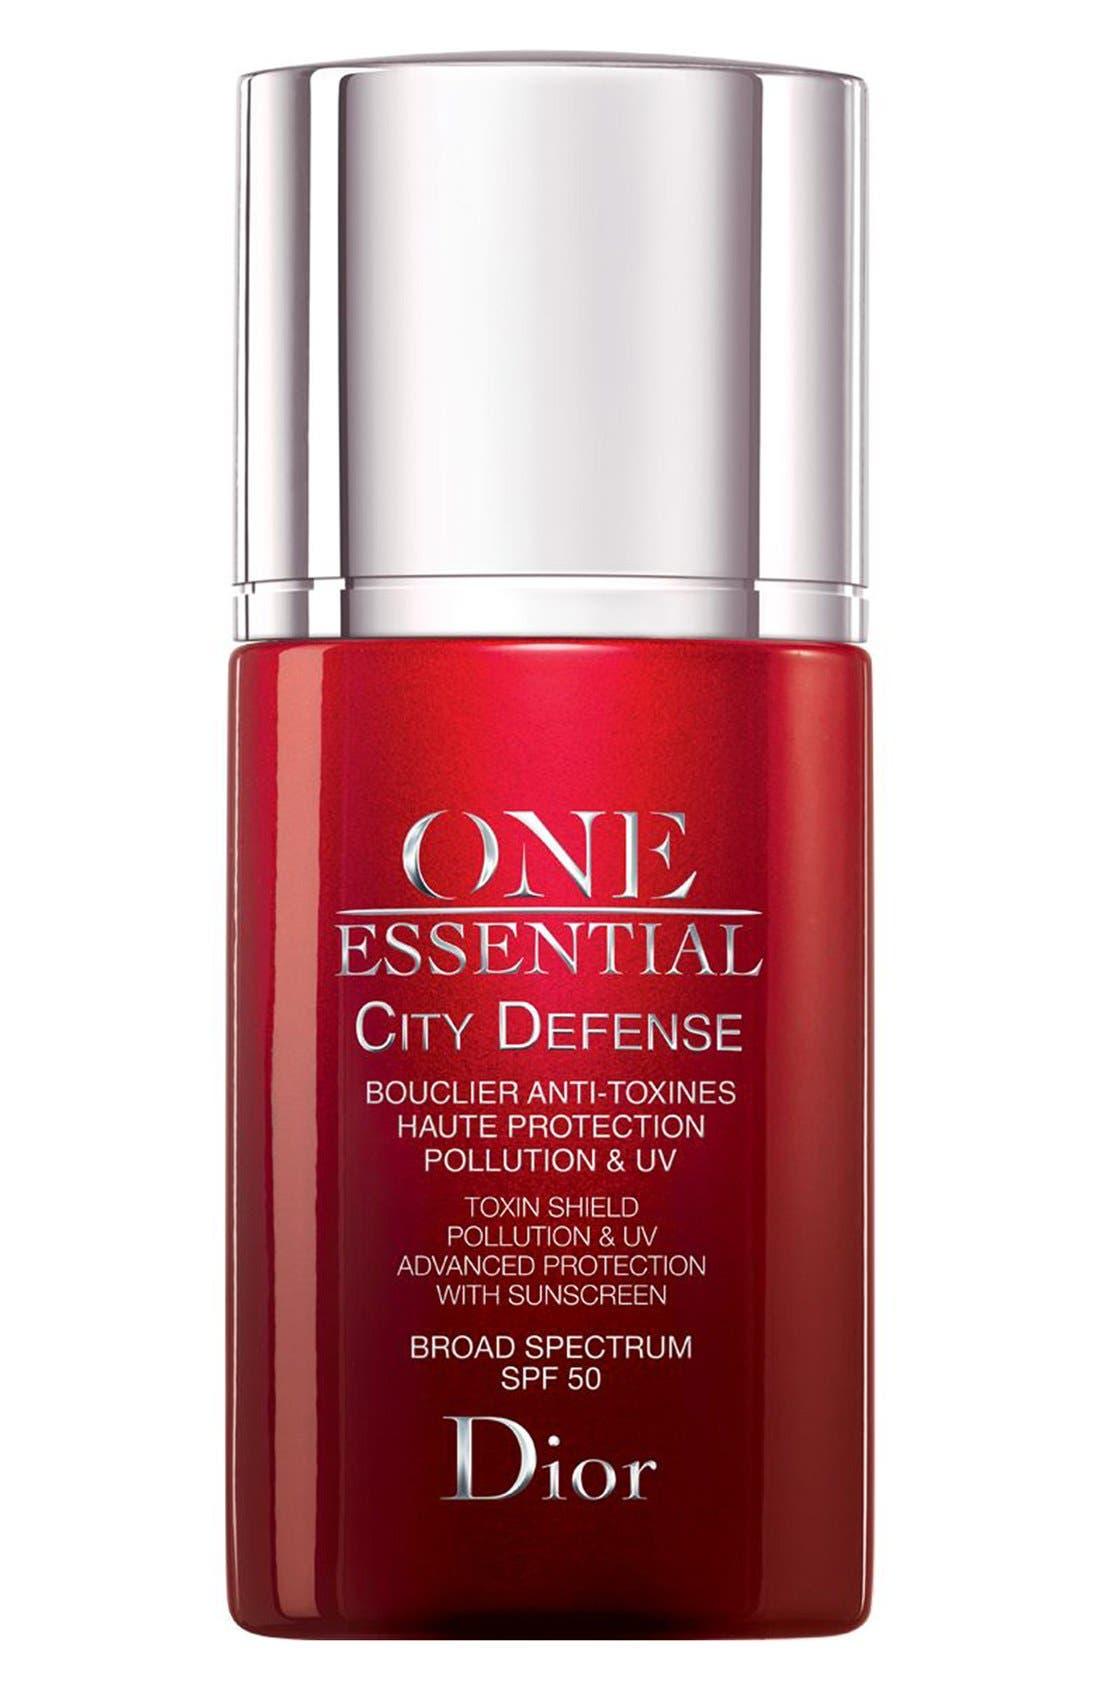 Dior 'One Essential' City Defense Toxin Shield Pollution & UV Advanced Protection SPF 50